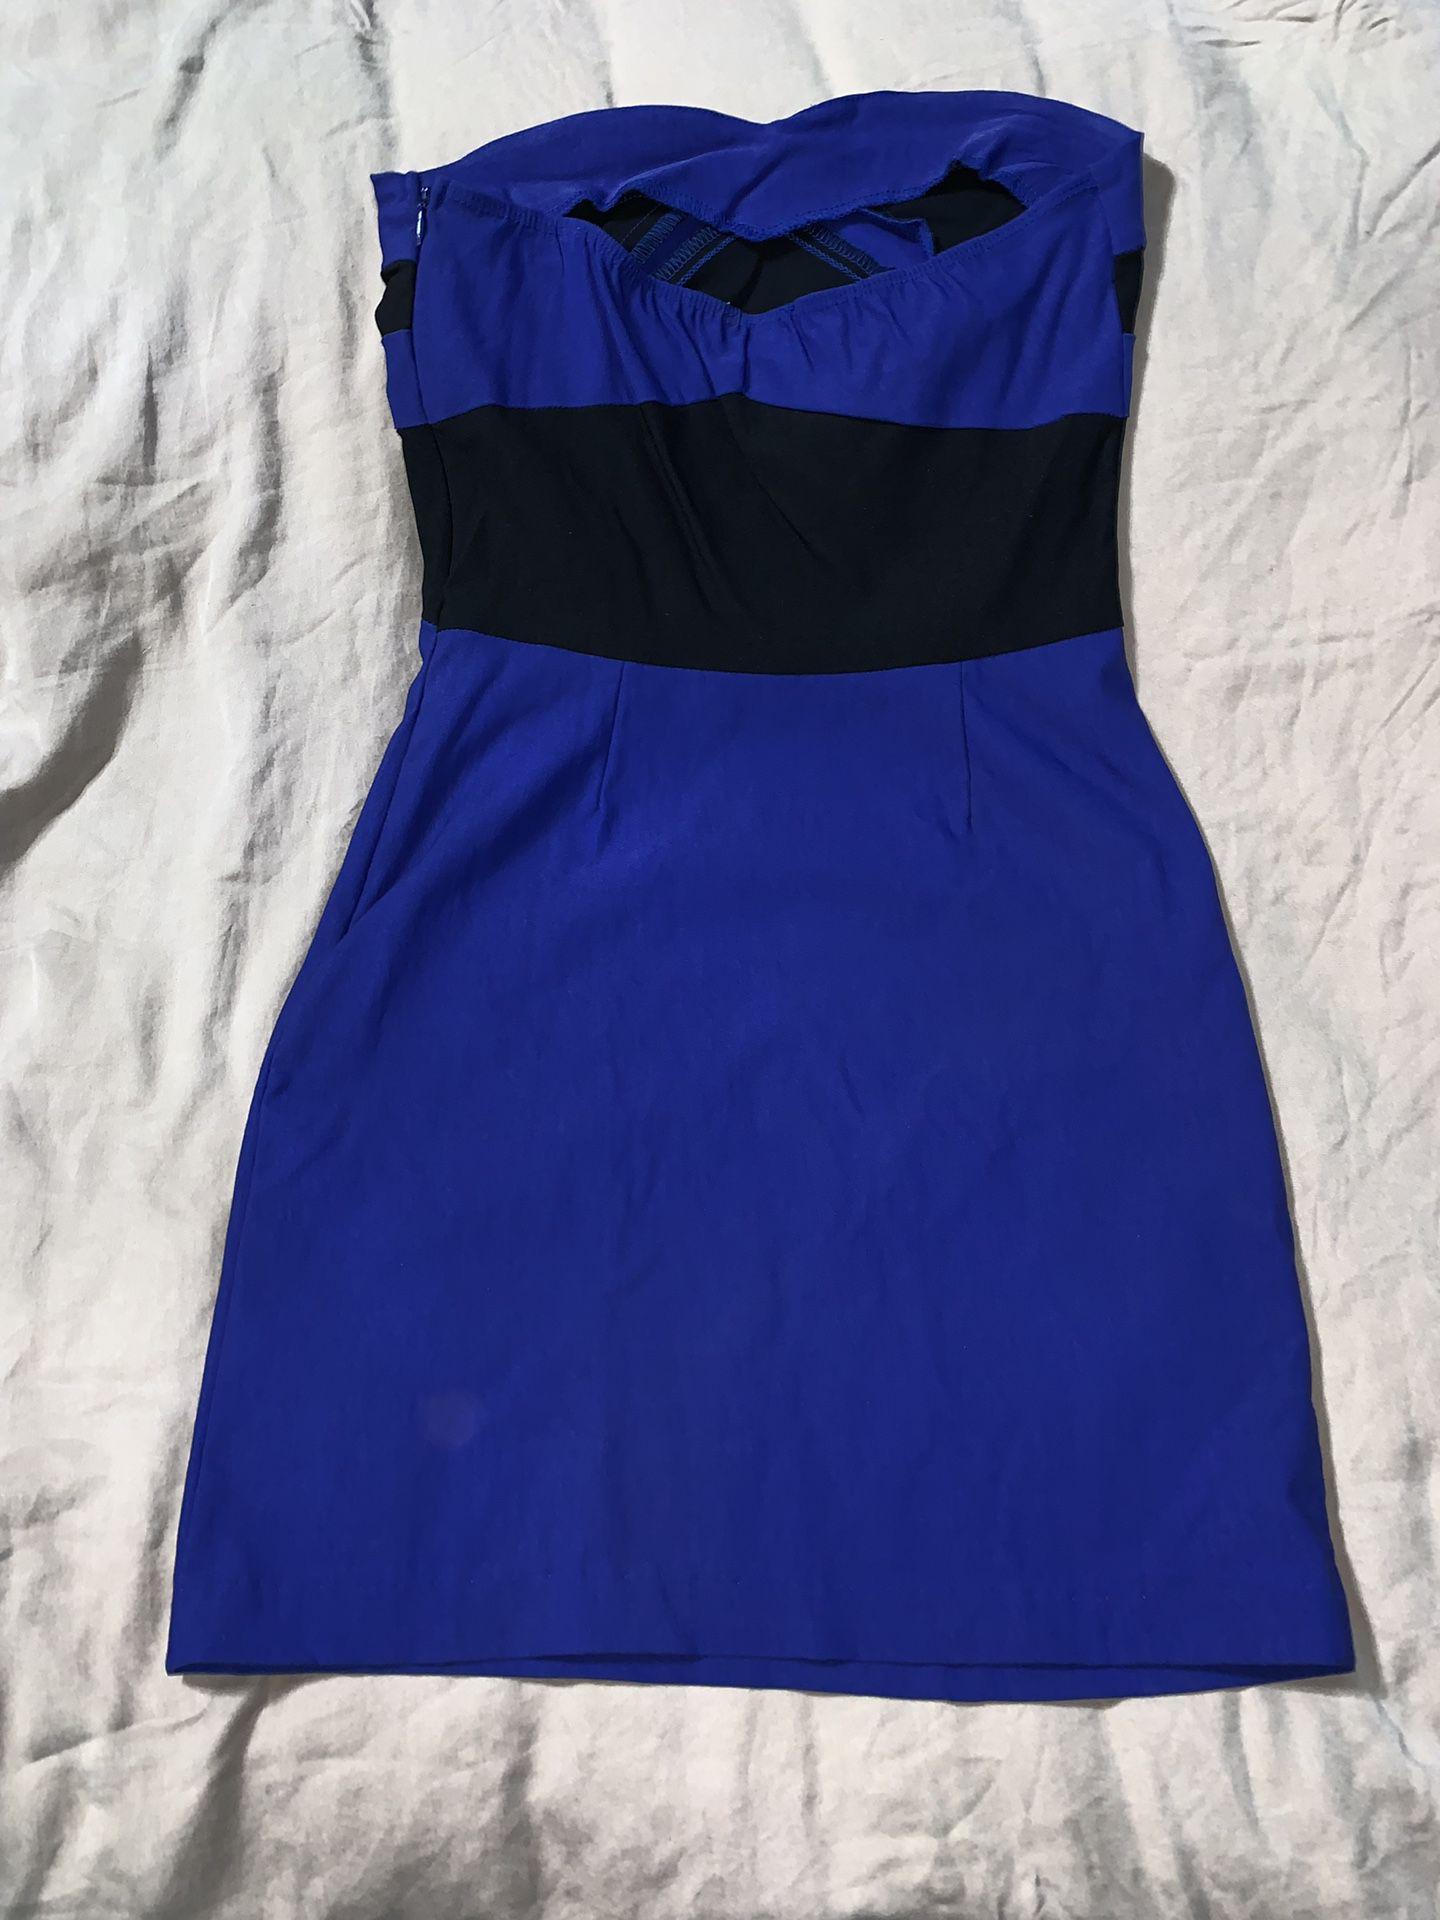 Black and blue strapless Dress